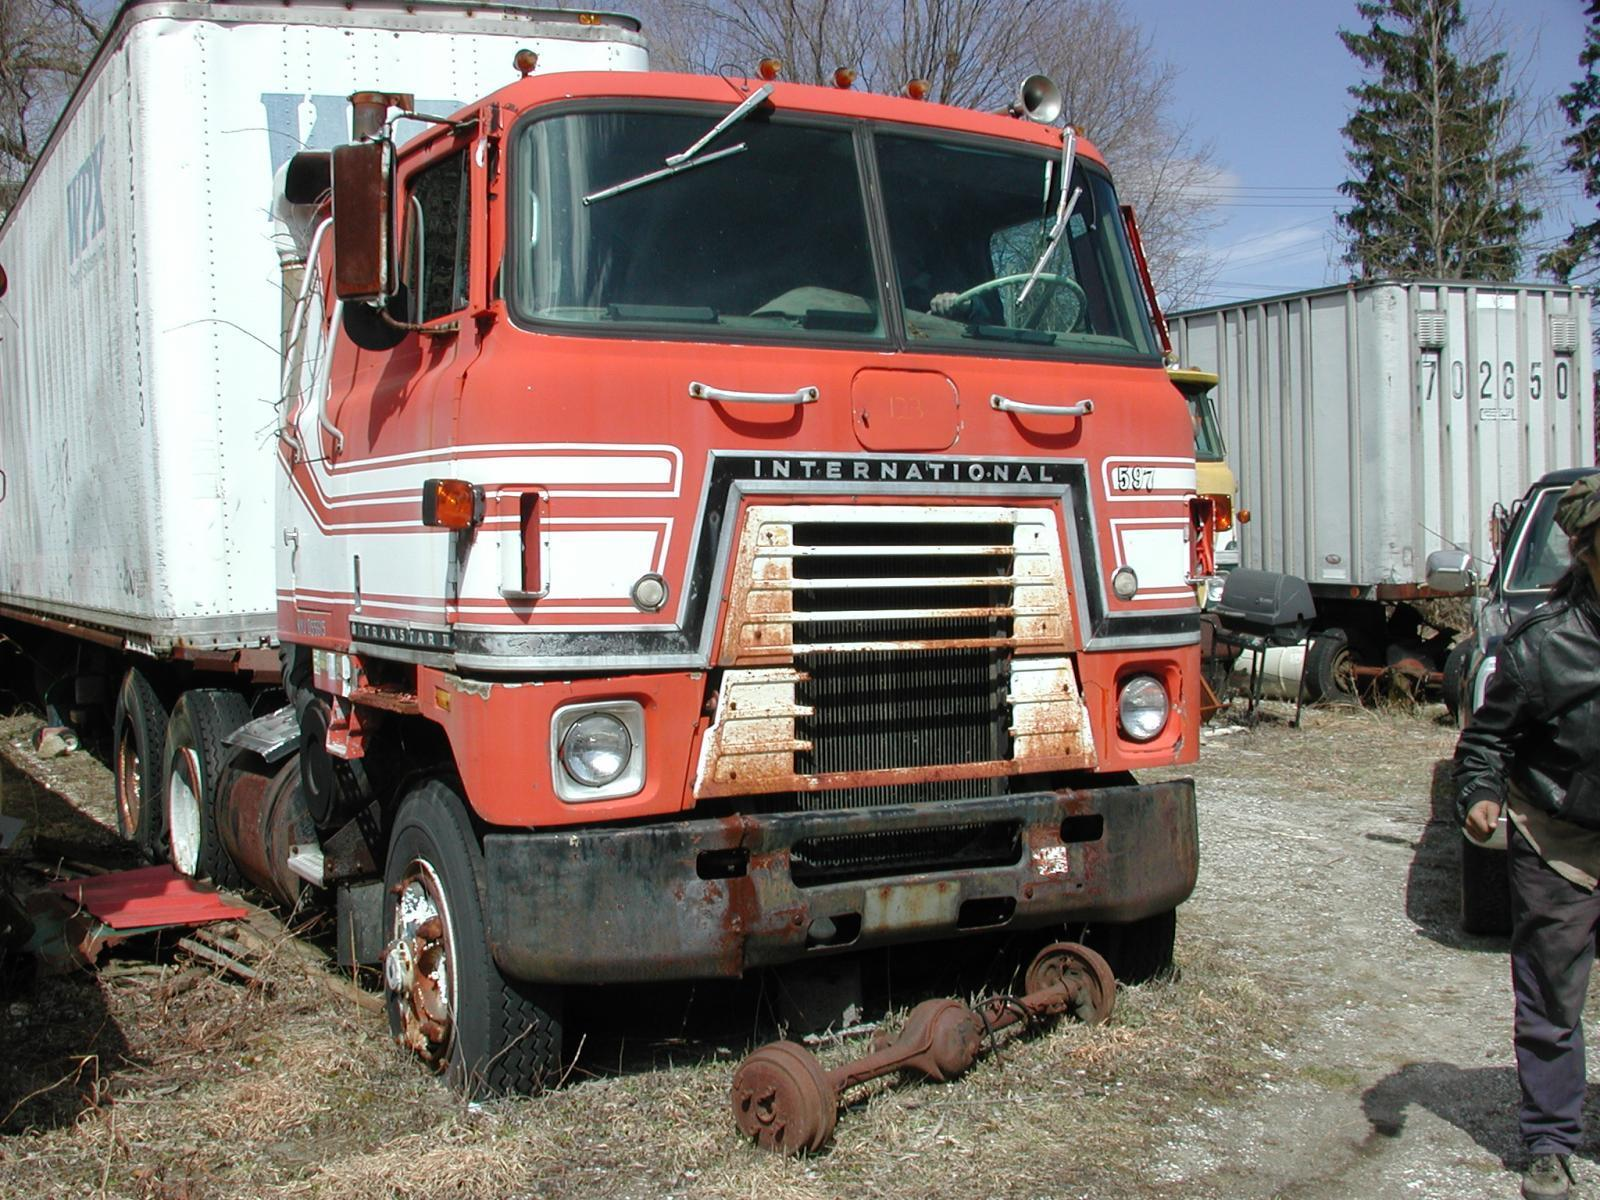 truck yard grave 060.jpg